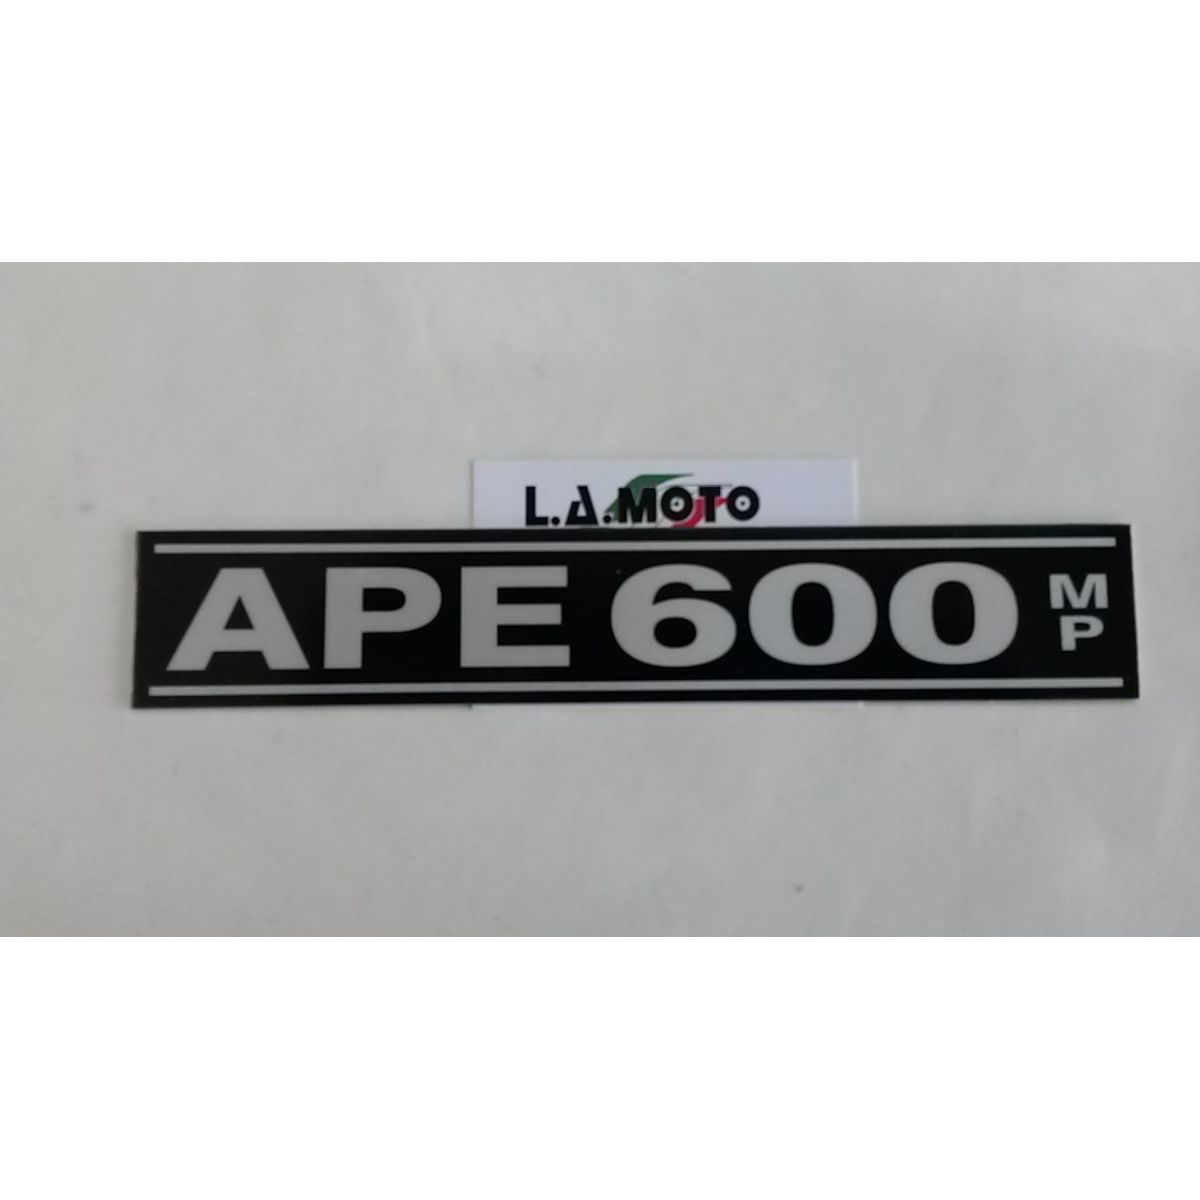 Scritta Ape 600 mp